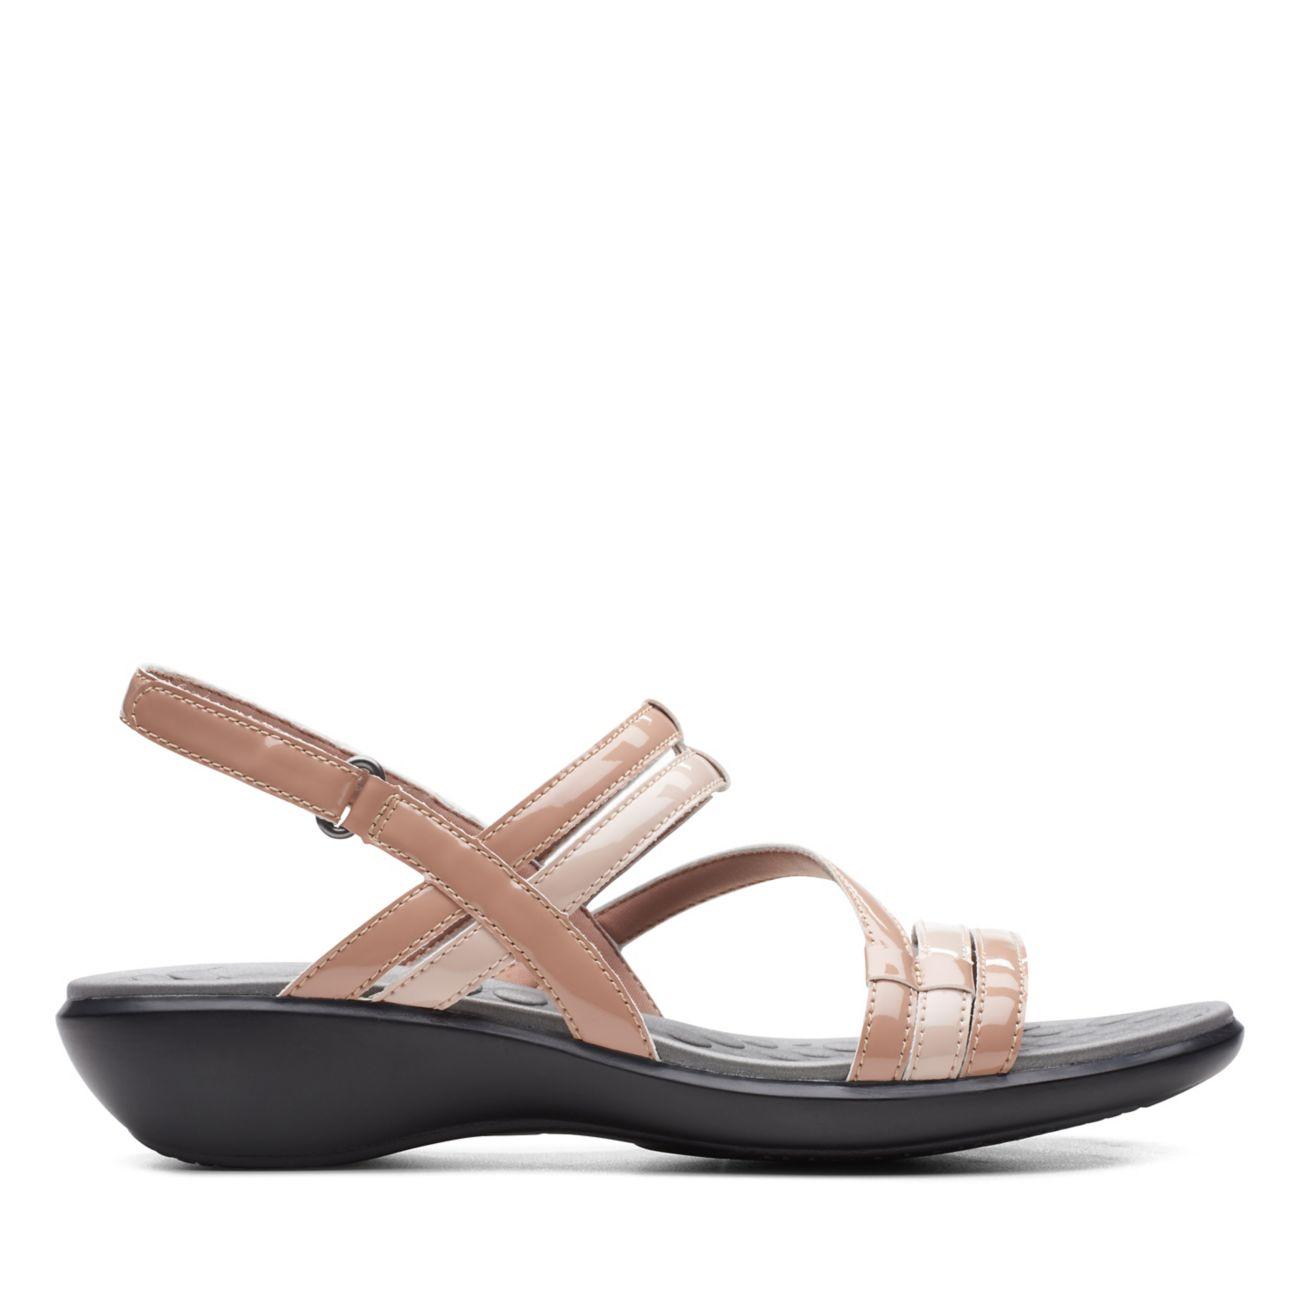 SONAR PIONEER Praline Combi -Womens Sandals- Clarks® Shoes Official Site | Clarks